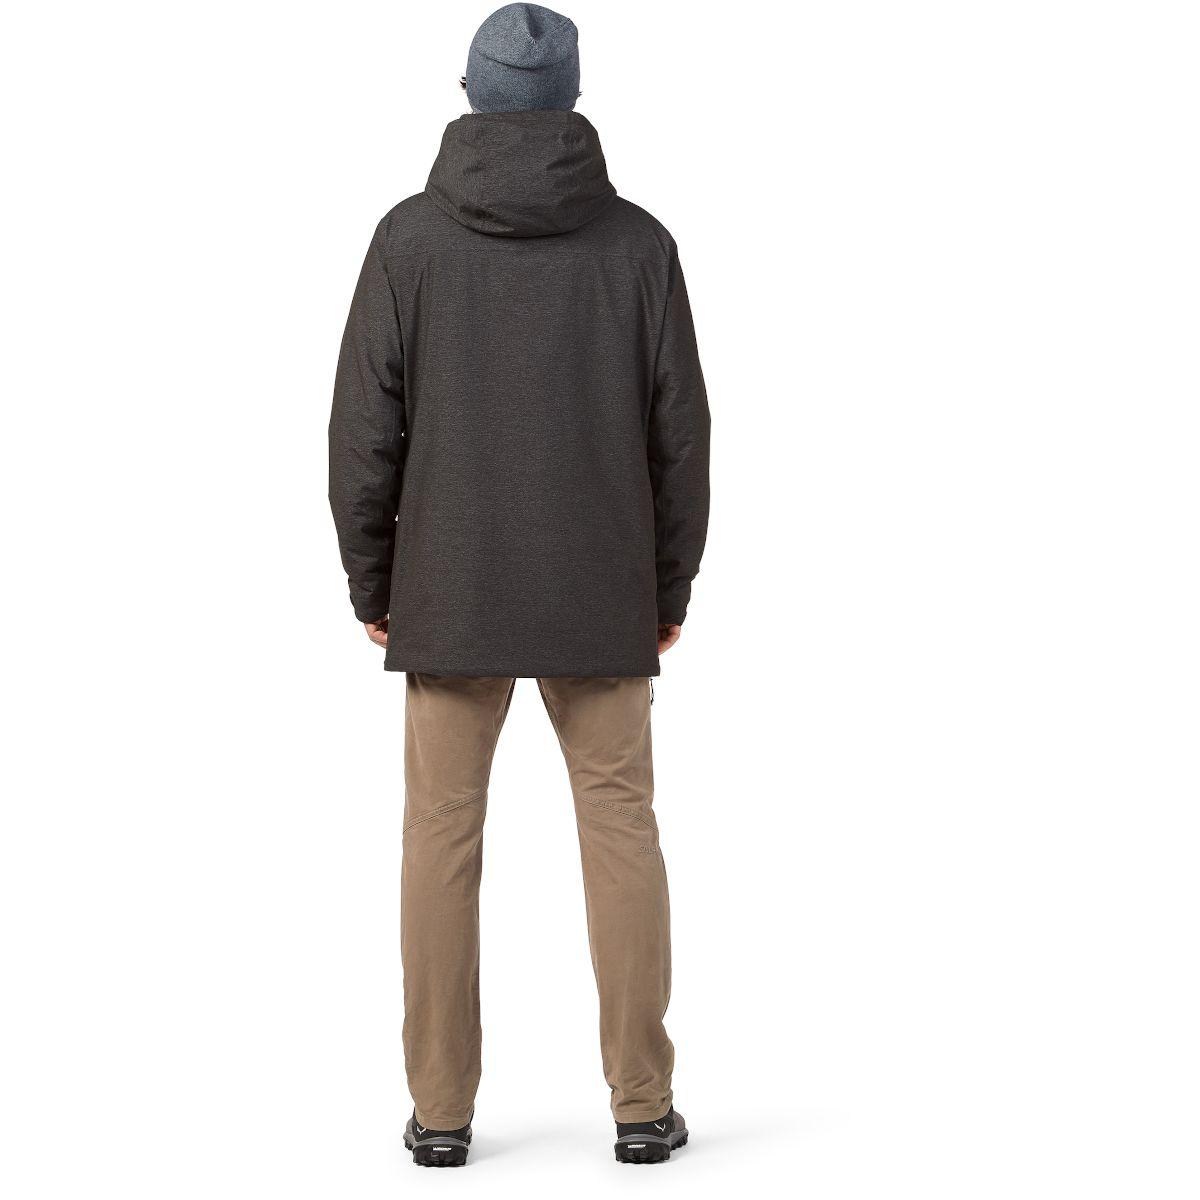 Куртка Salewa Fanes 2 Powertex/Tirolwool Celliant Mns Jacket